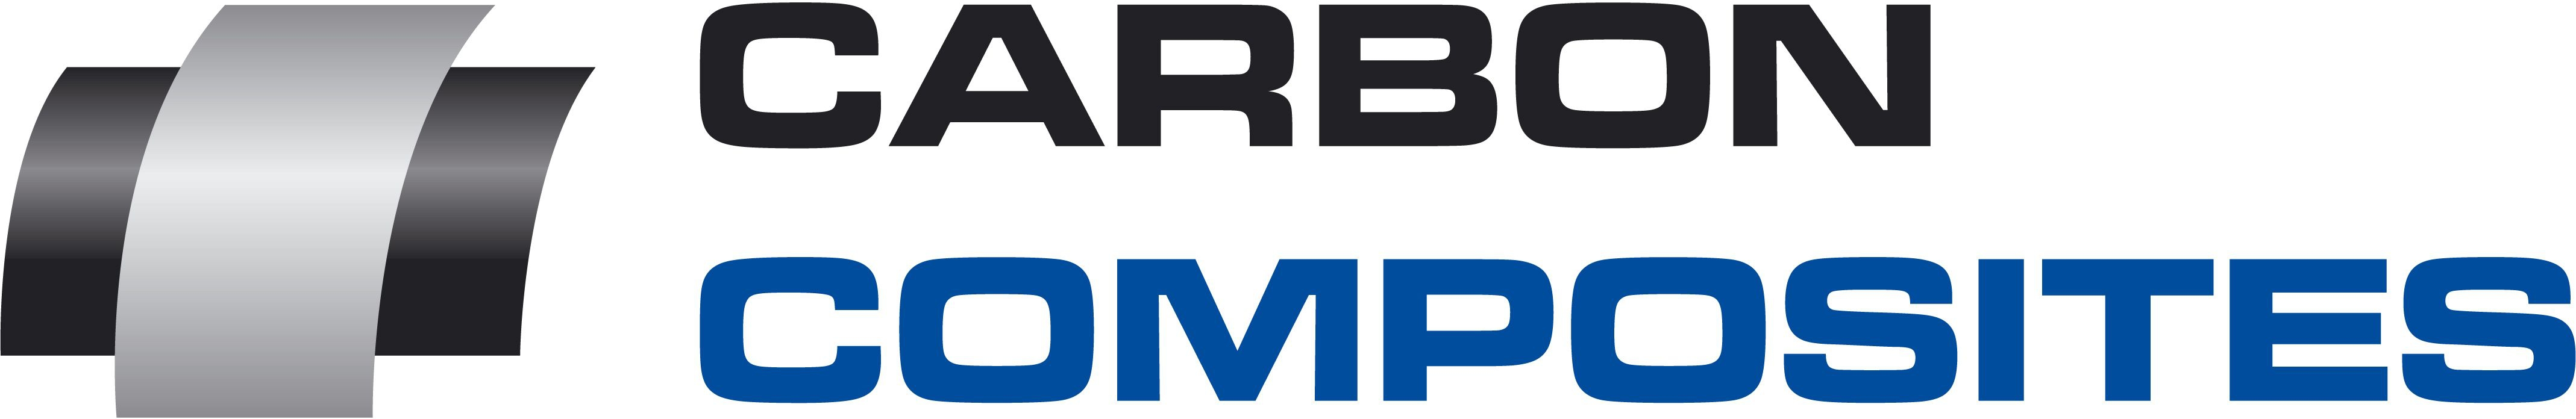 Carbon Composites Leichtbau Gipfel